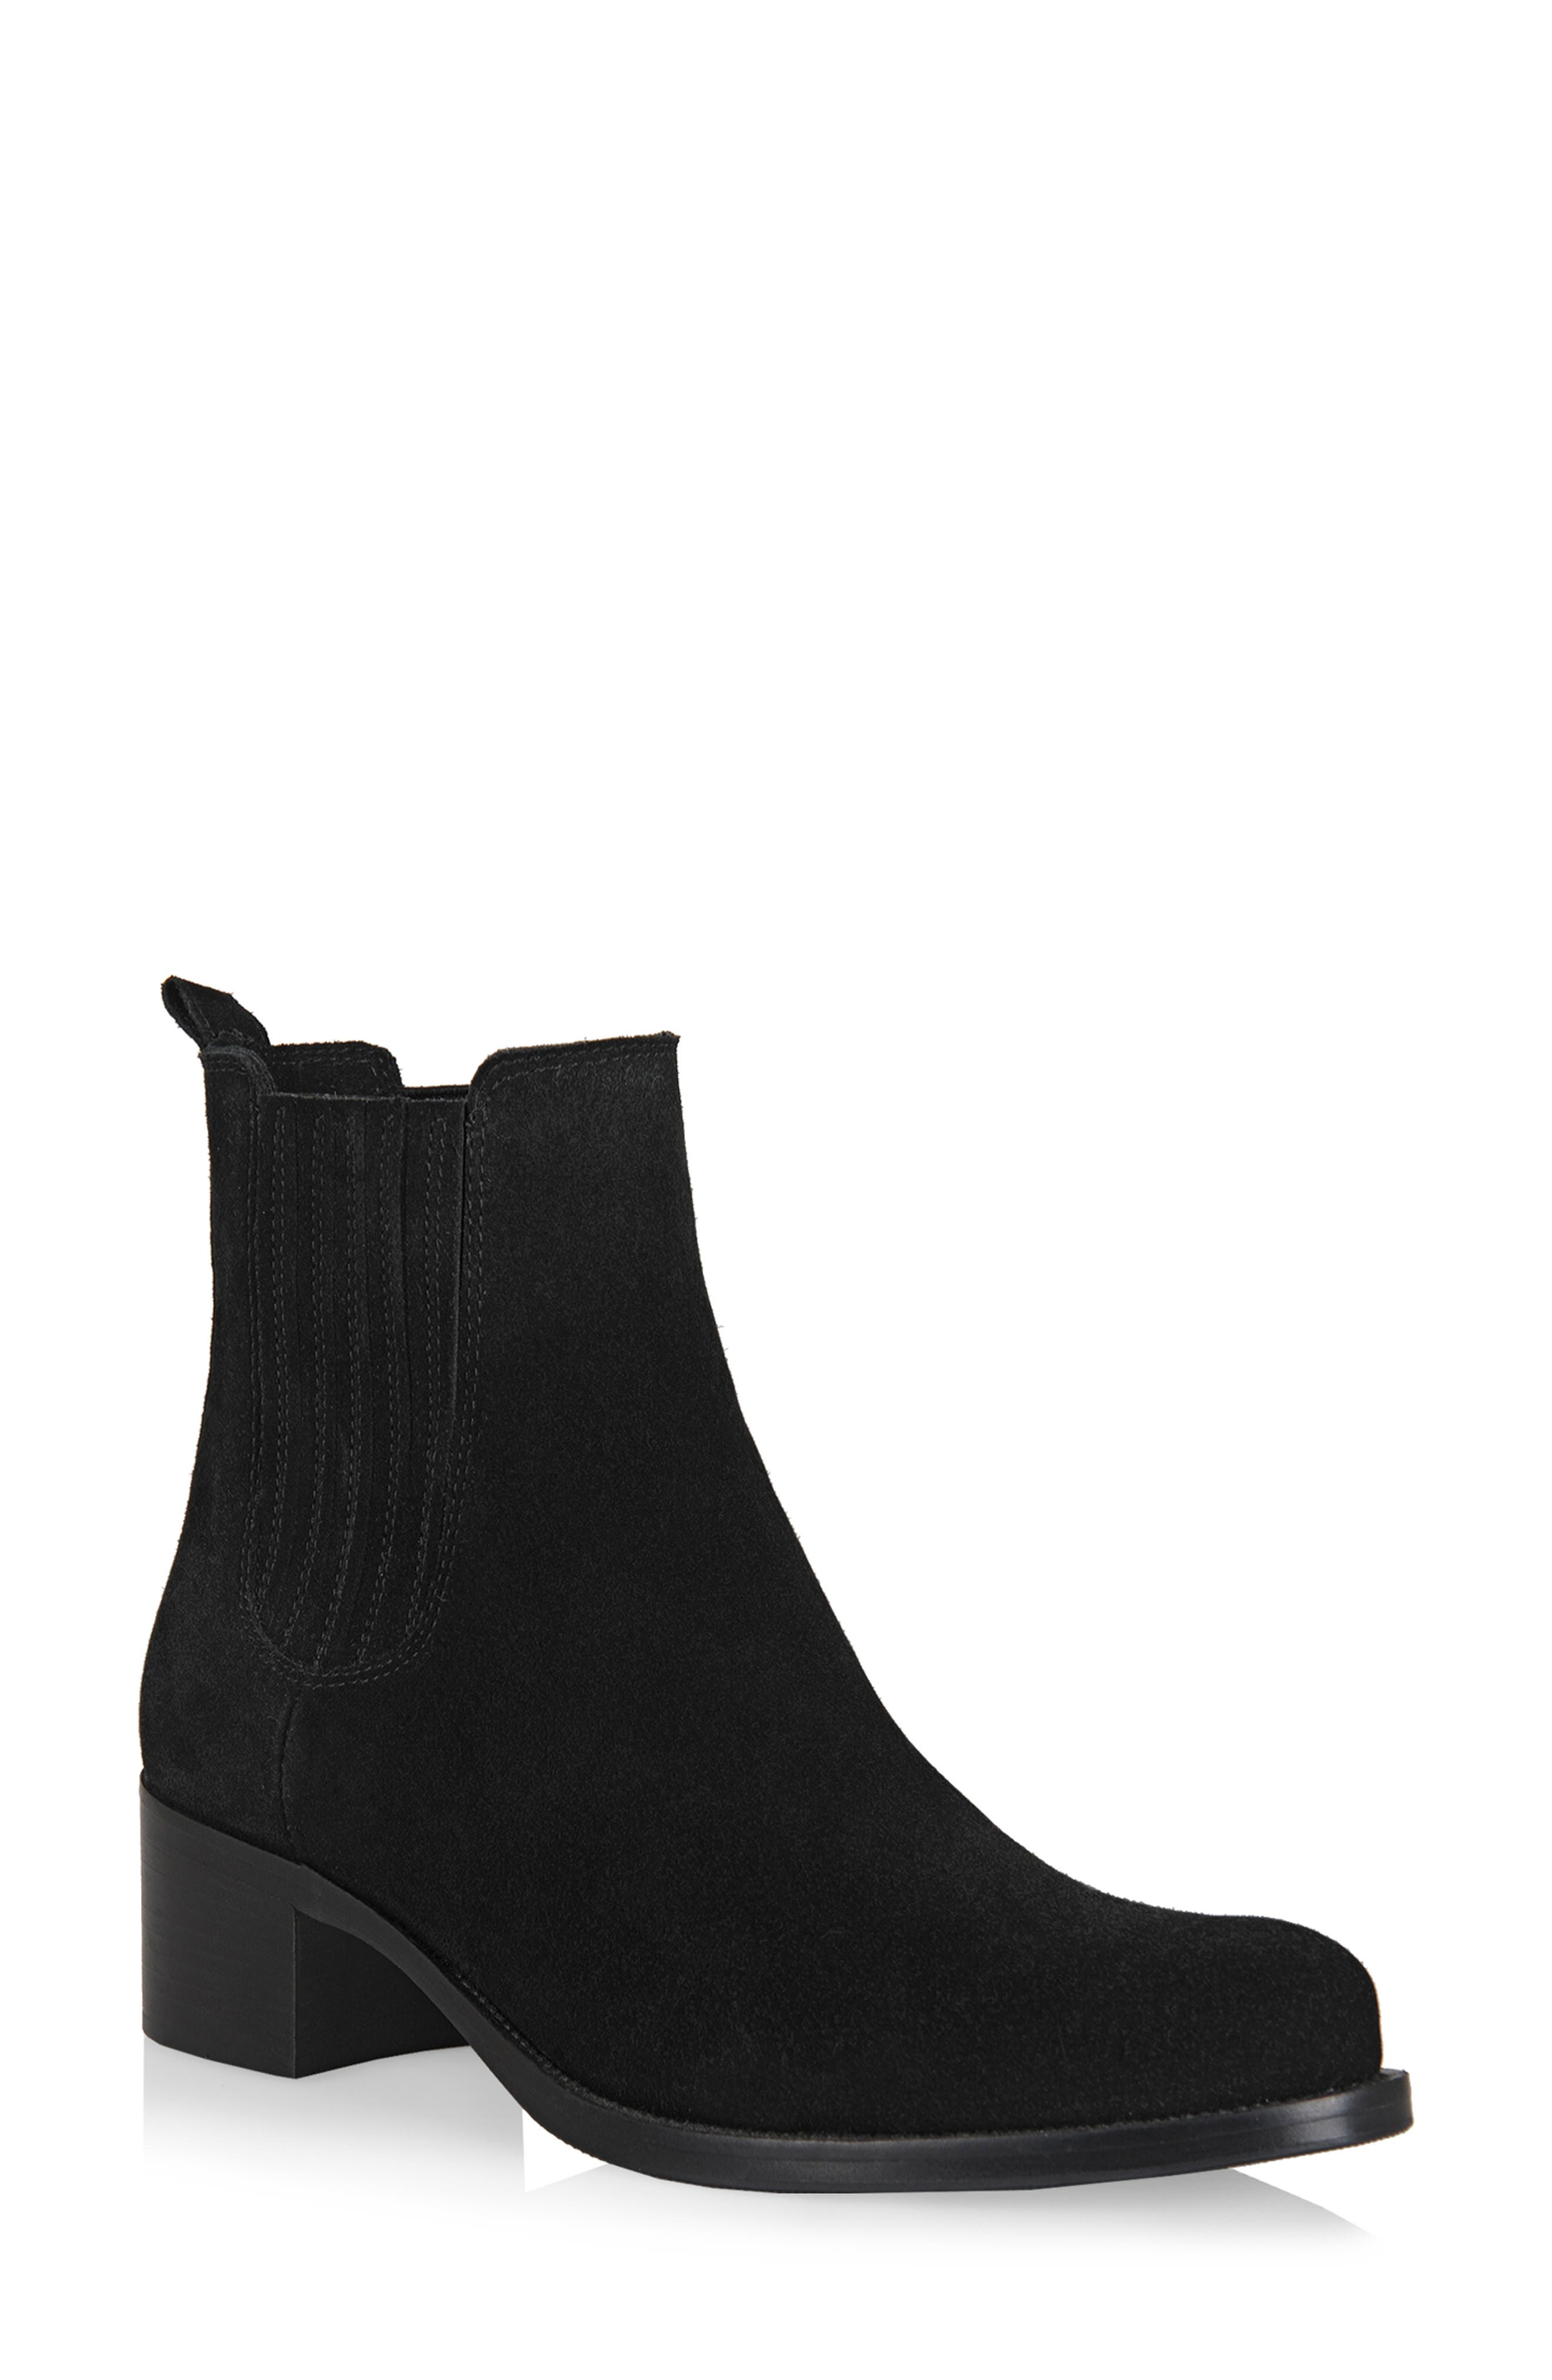 Women's Dress Booties \u0026 Ankle Boots